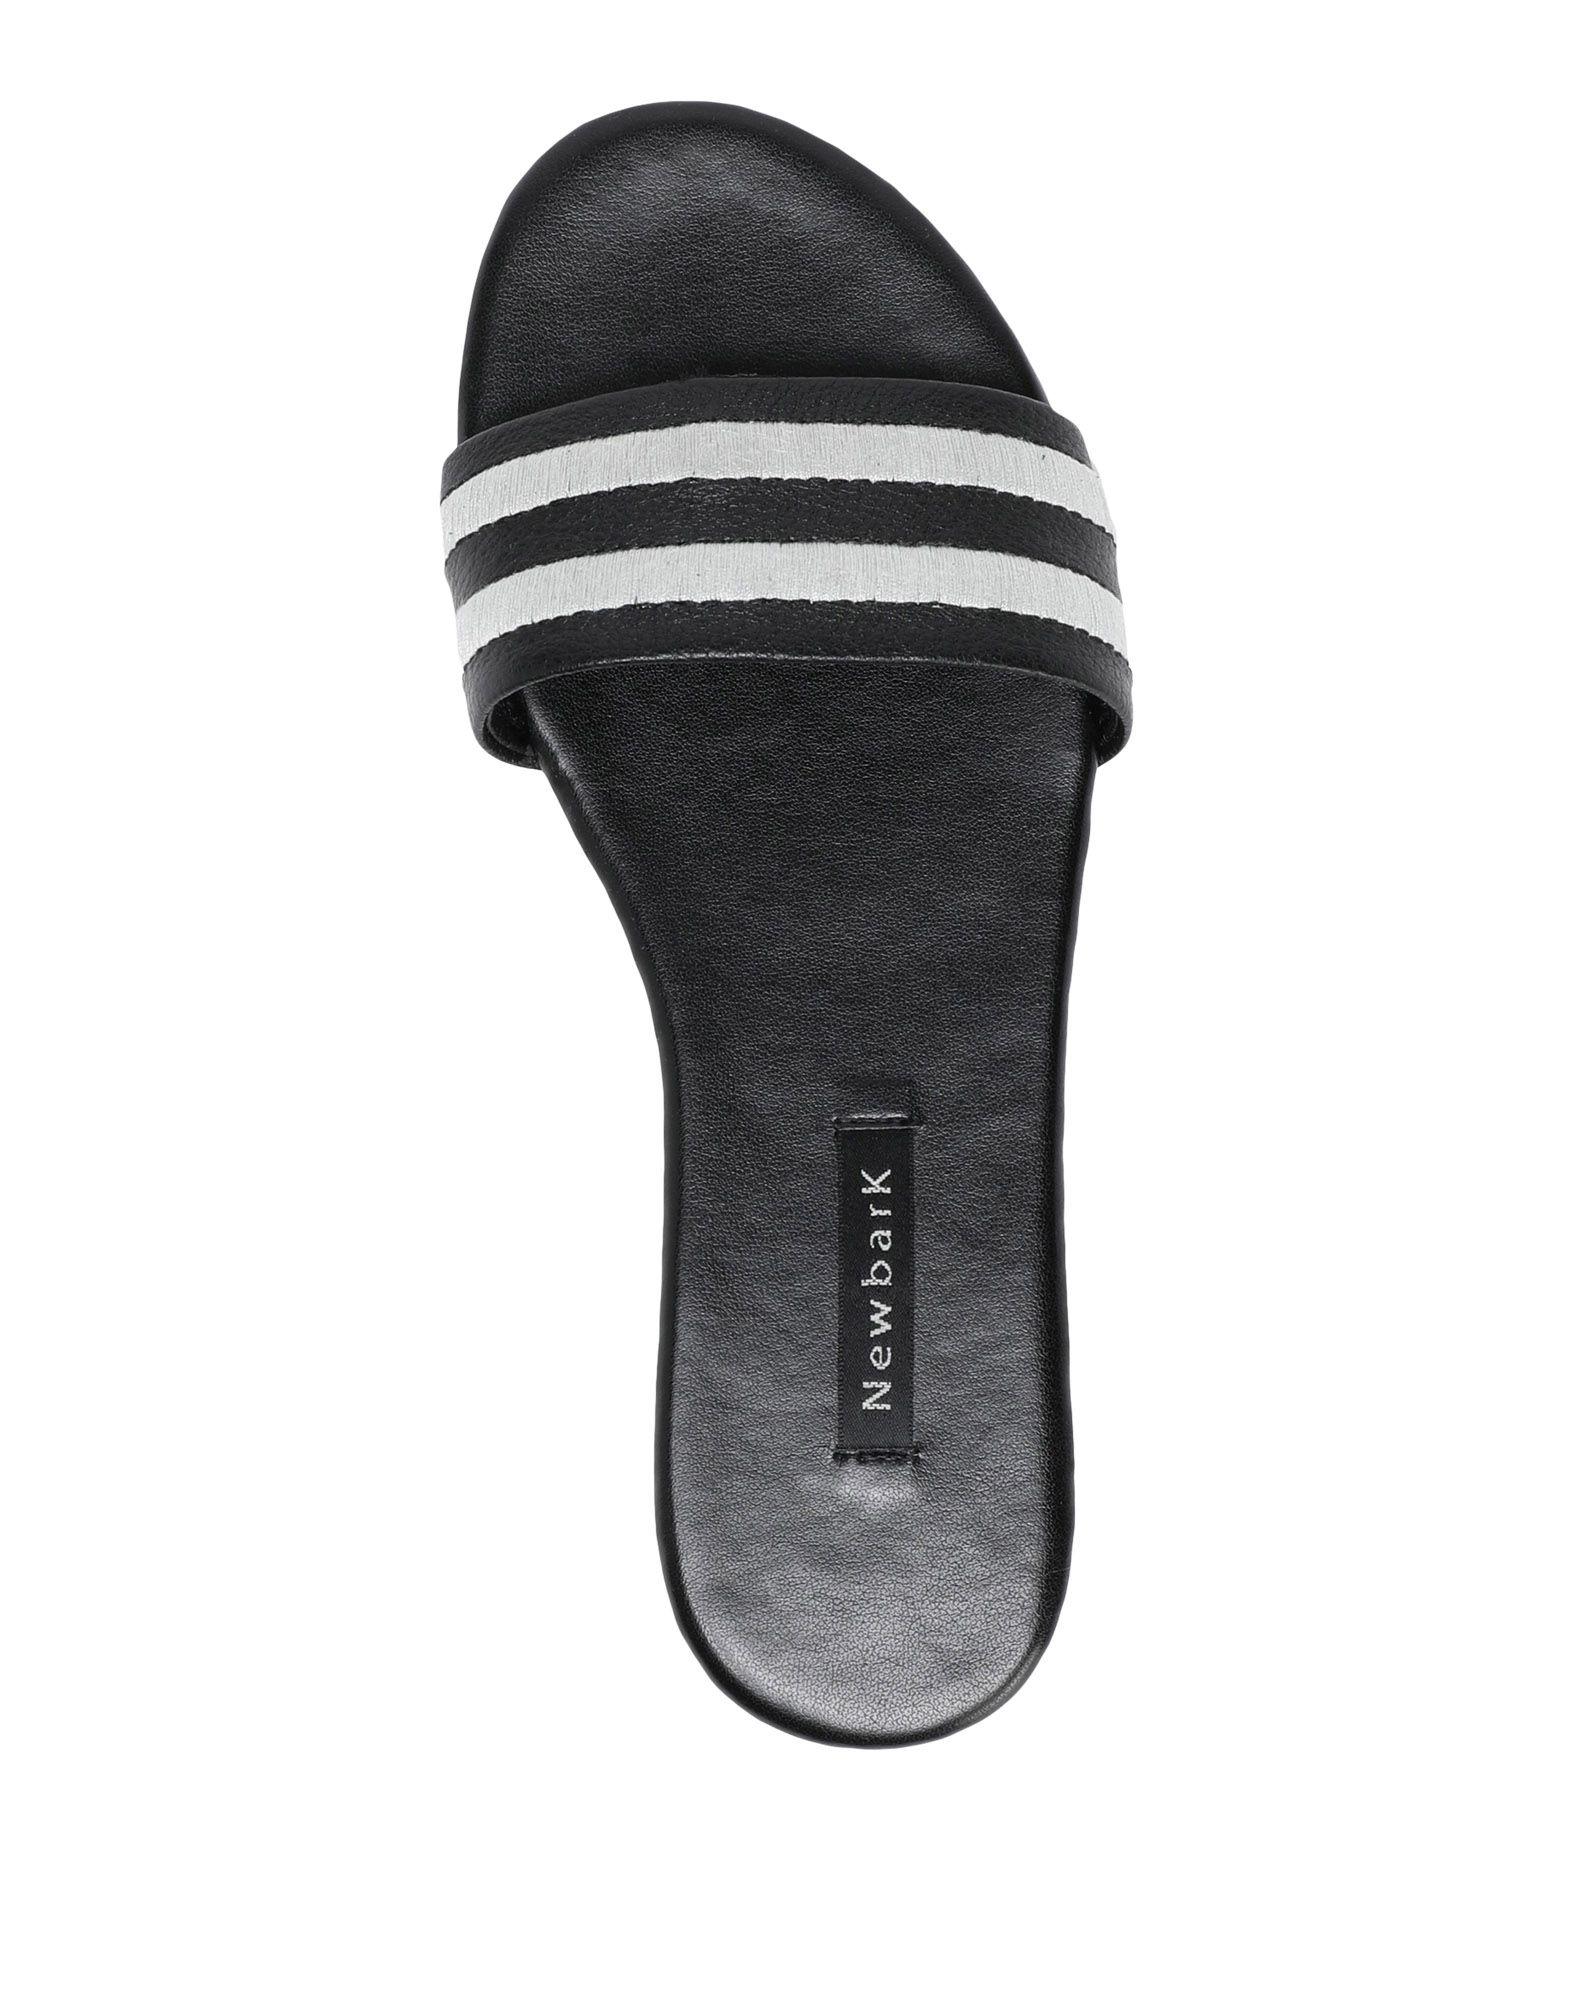 Stilvolle billige Dianetten Schuhe Newbark Dianetten billige Damen  11531907WN 5bb12d